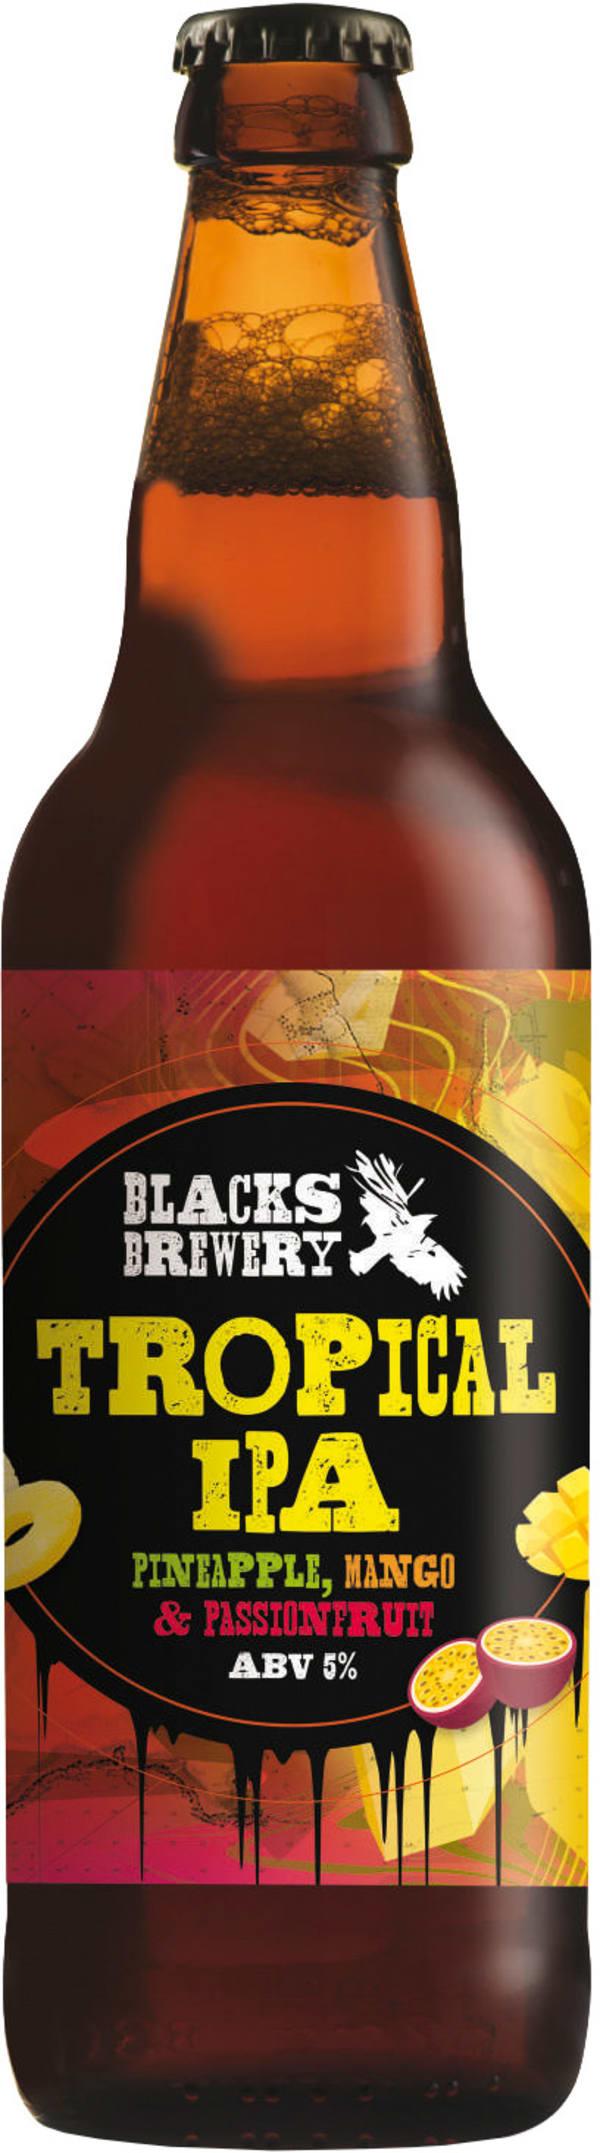 Blacks Tropical IPA